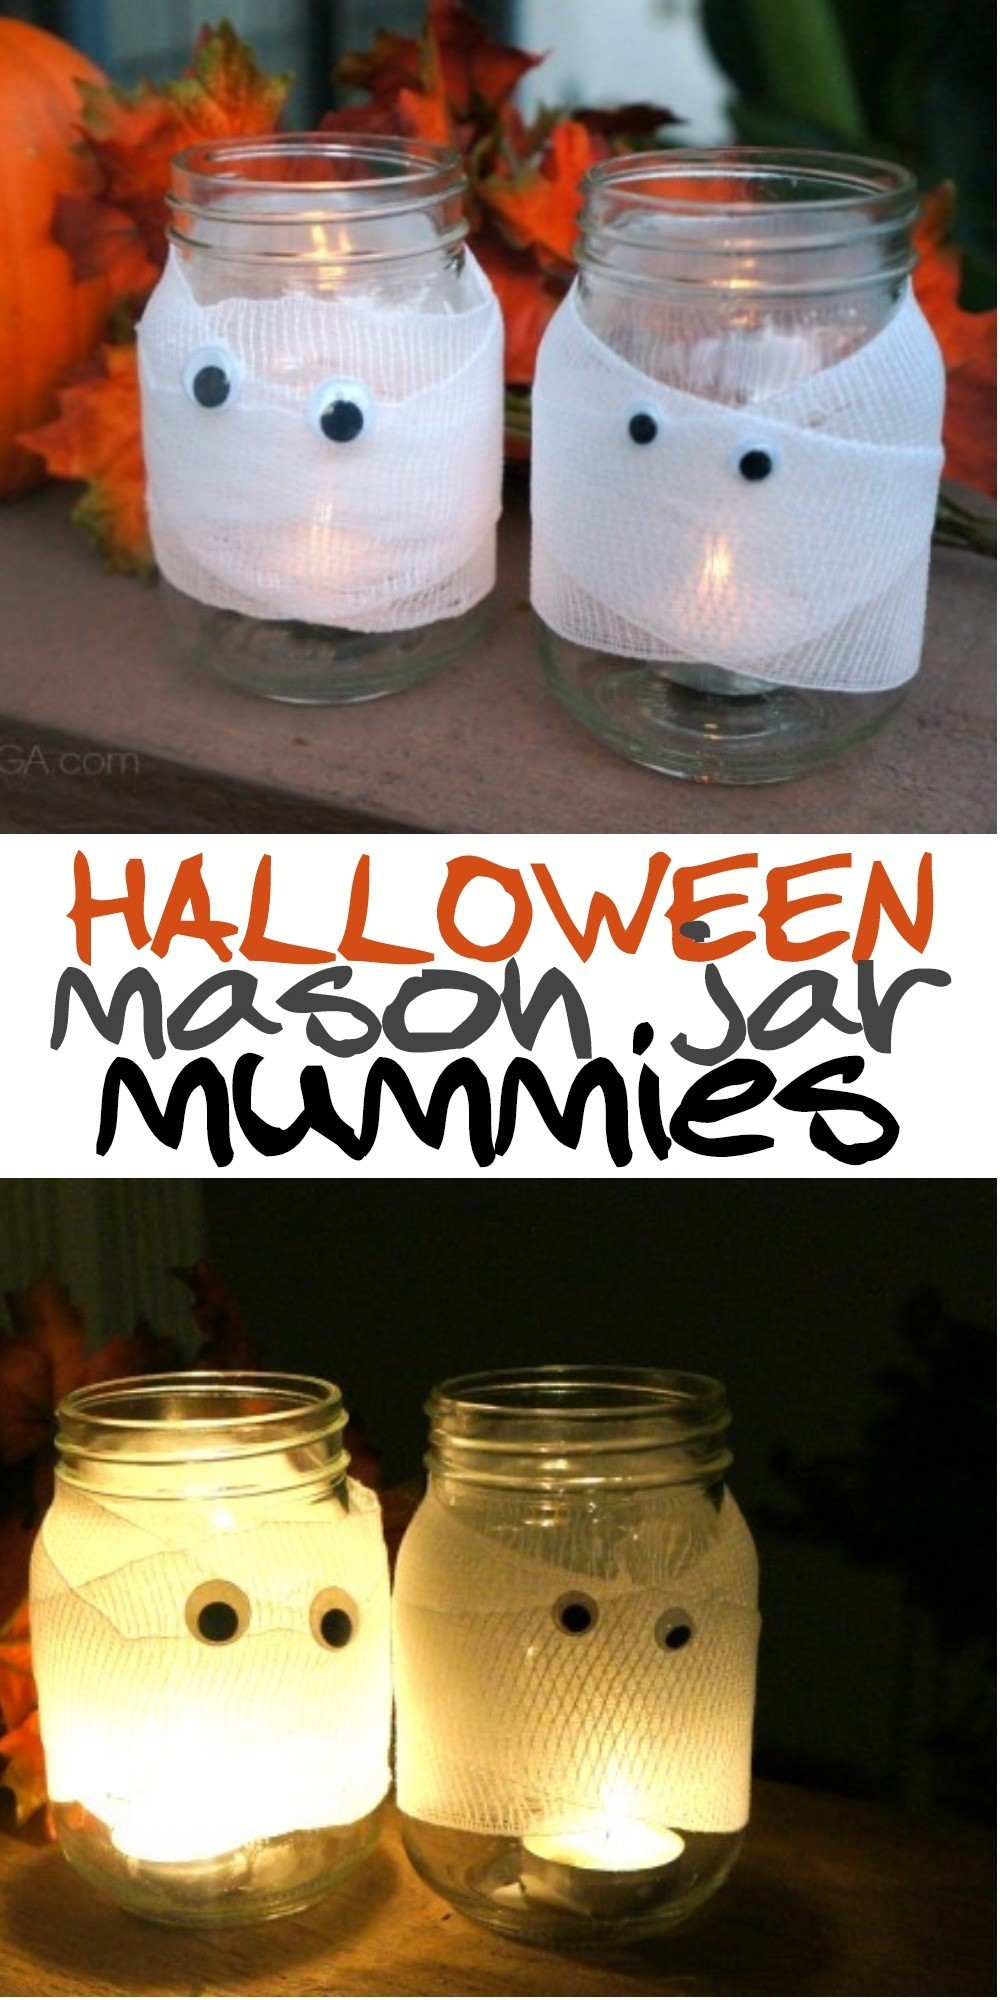 DIY Halloween Decor: Spooky Halloween Mason Jar Mummy Candles